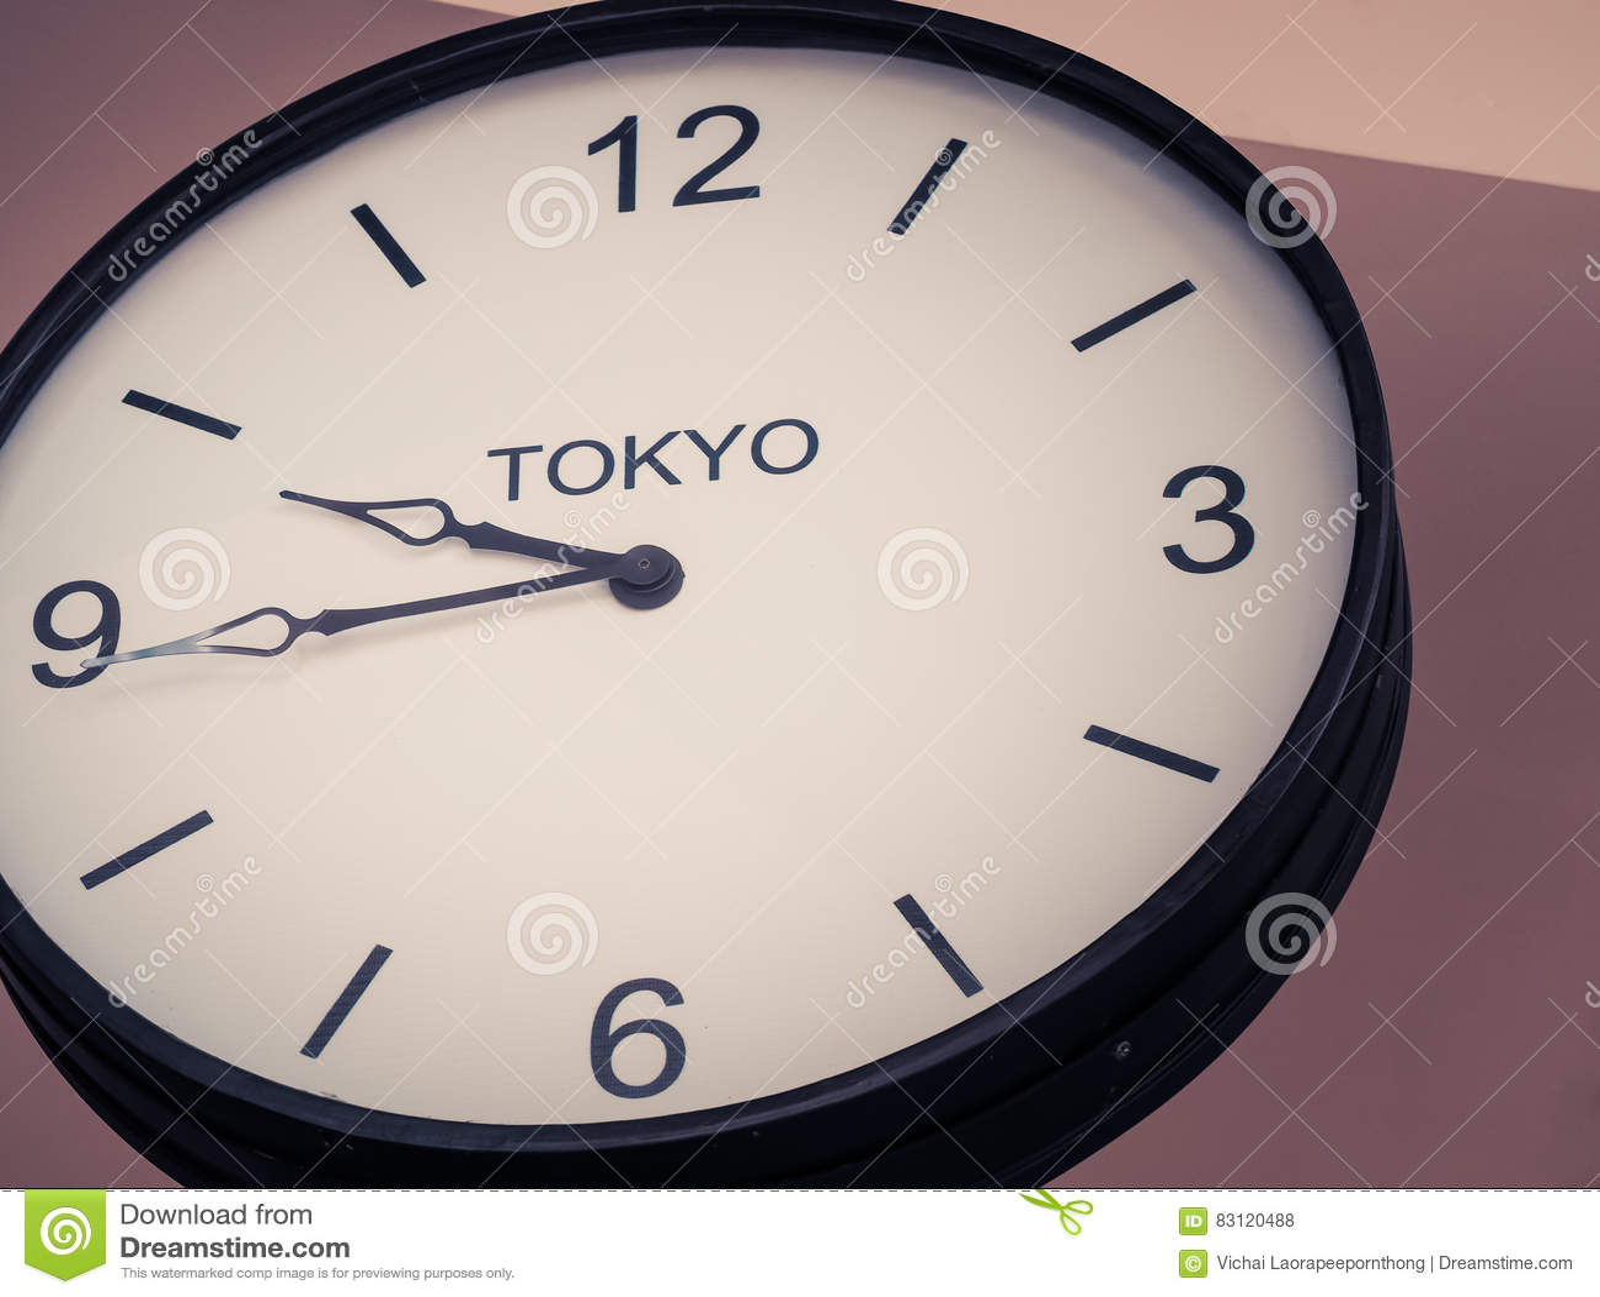 Japanese time clock prt1bmw 9